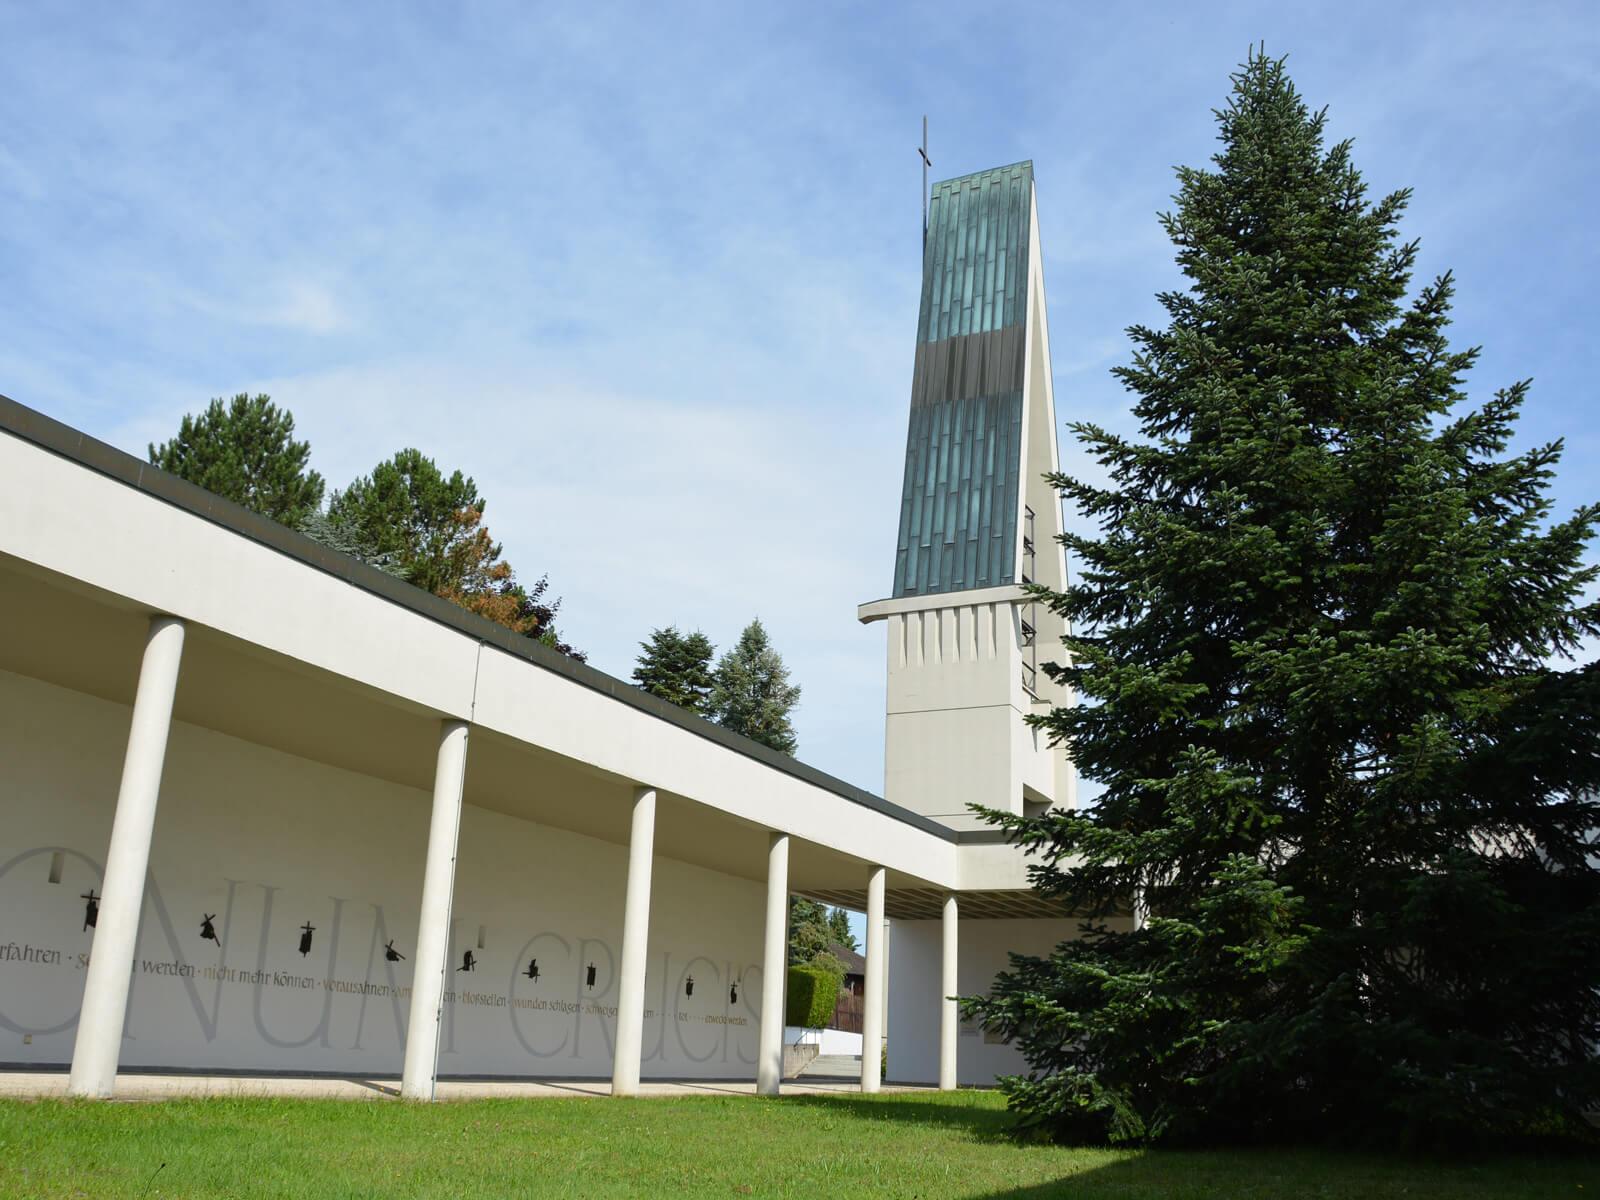 Kirche Sankt Vitus. Foto: Kerstin Weidner